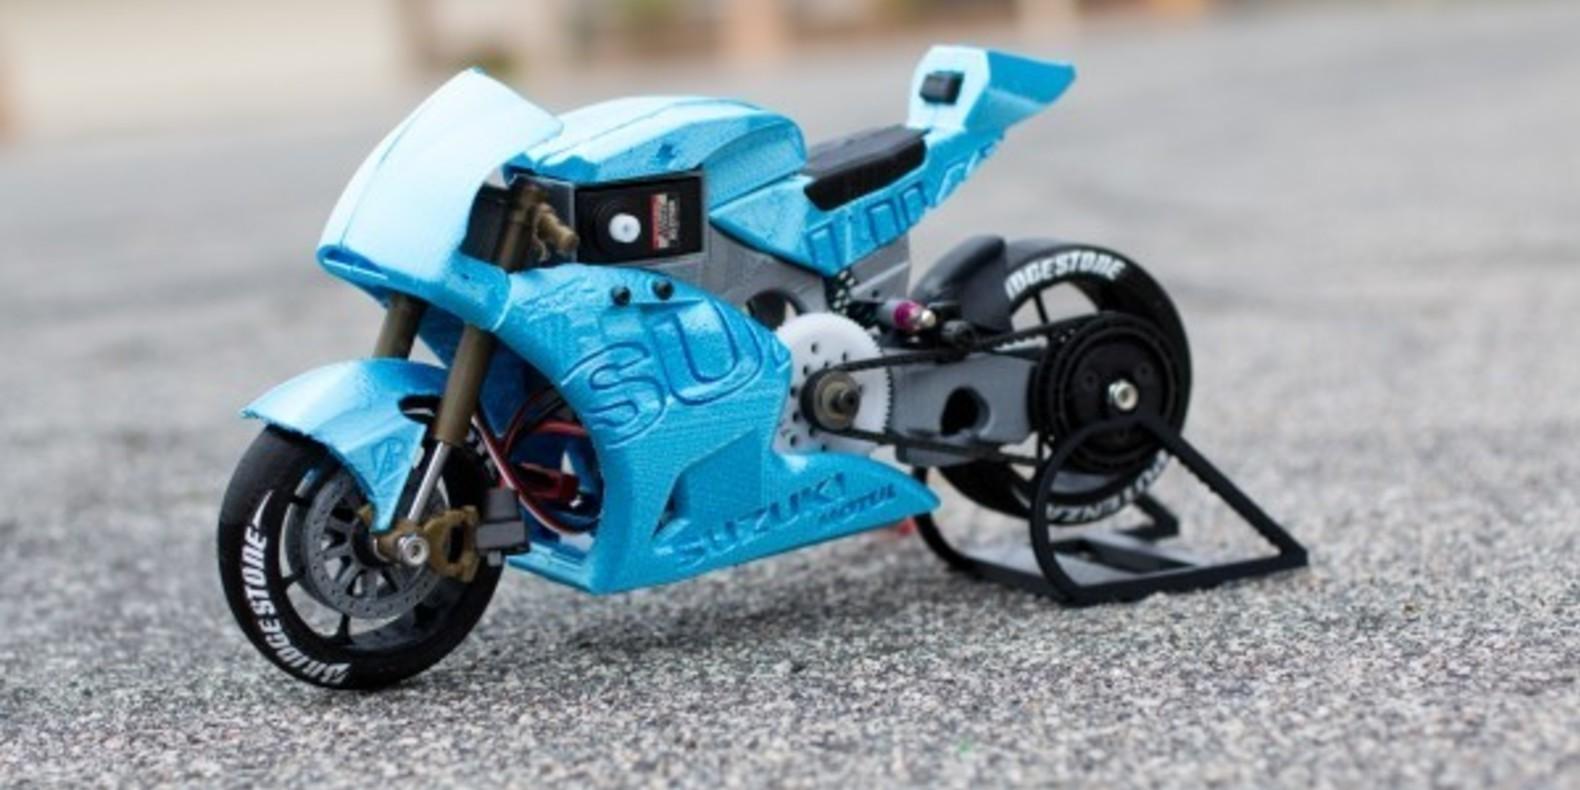 brett-3D-model-moto-télécommandée-cults-6.jpg